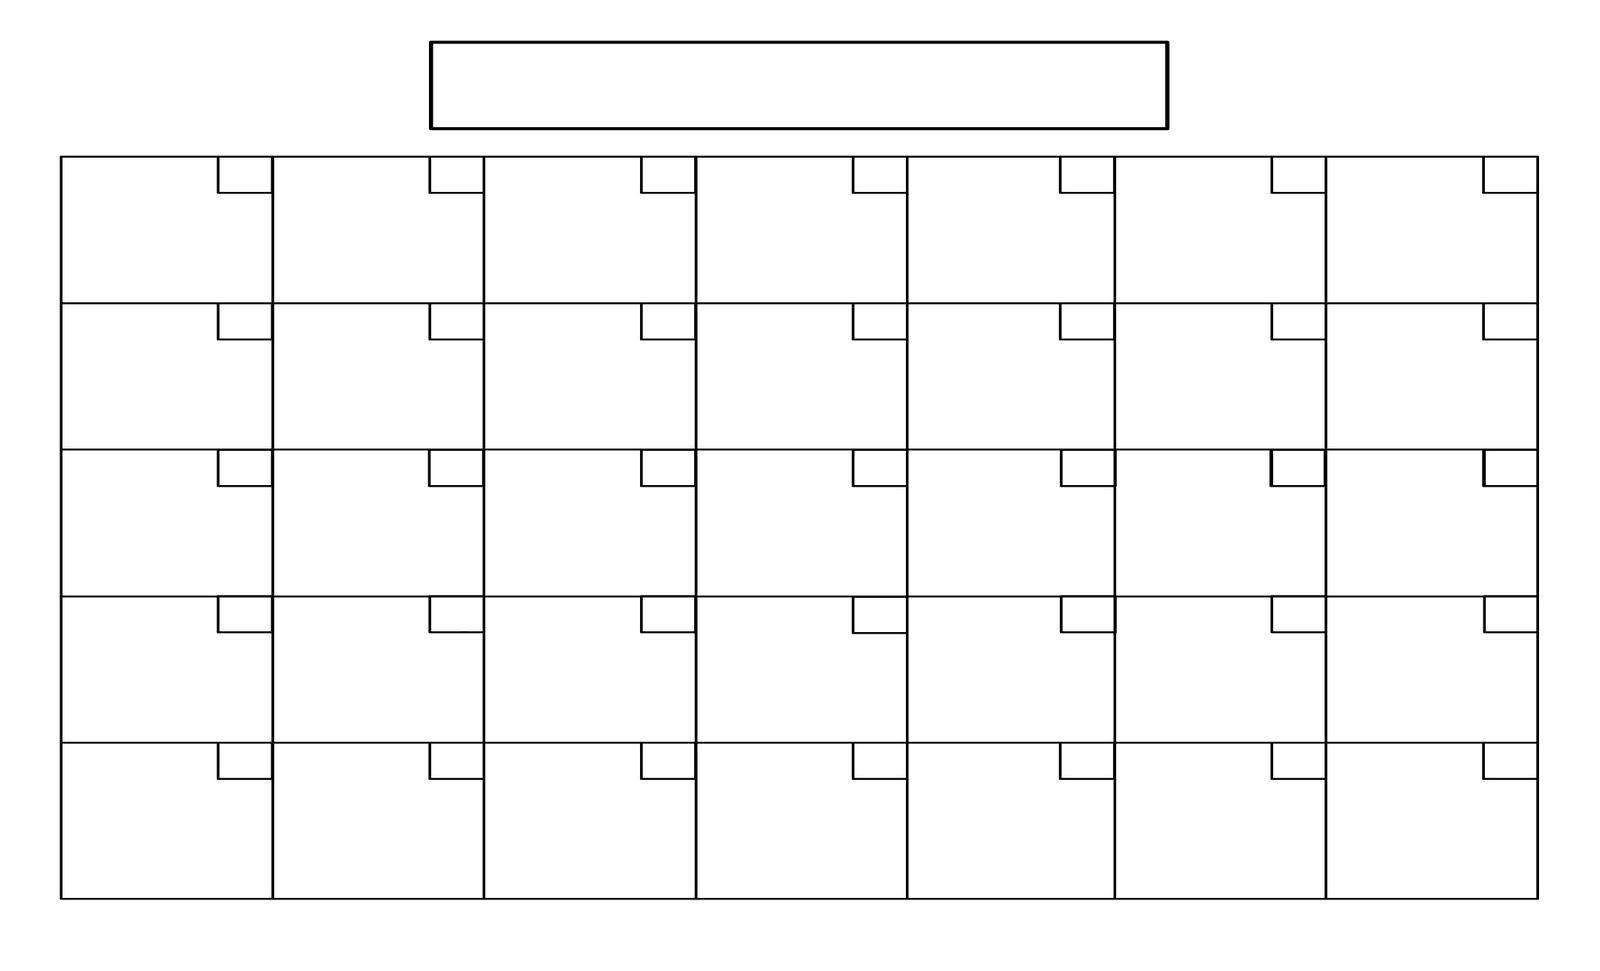 Printable+Full+Page+Blank+Calendar+Template | Boyscout | Blank inside Full Page Monthly Calendar Printable